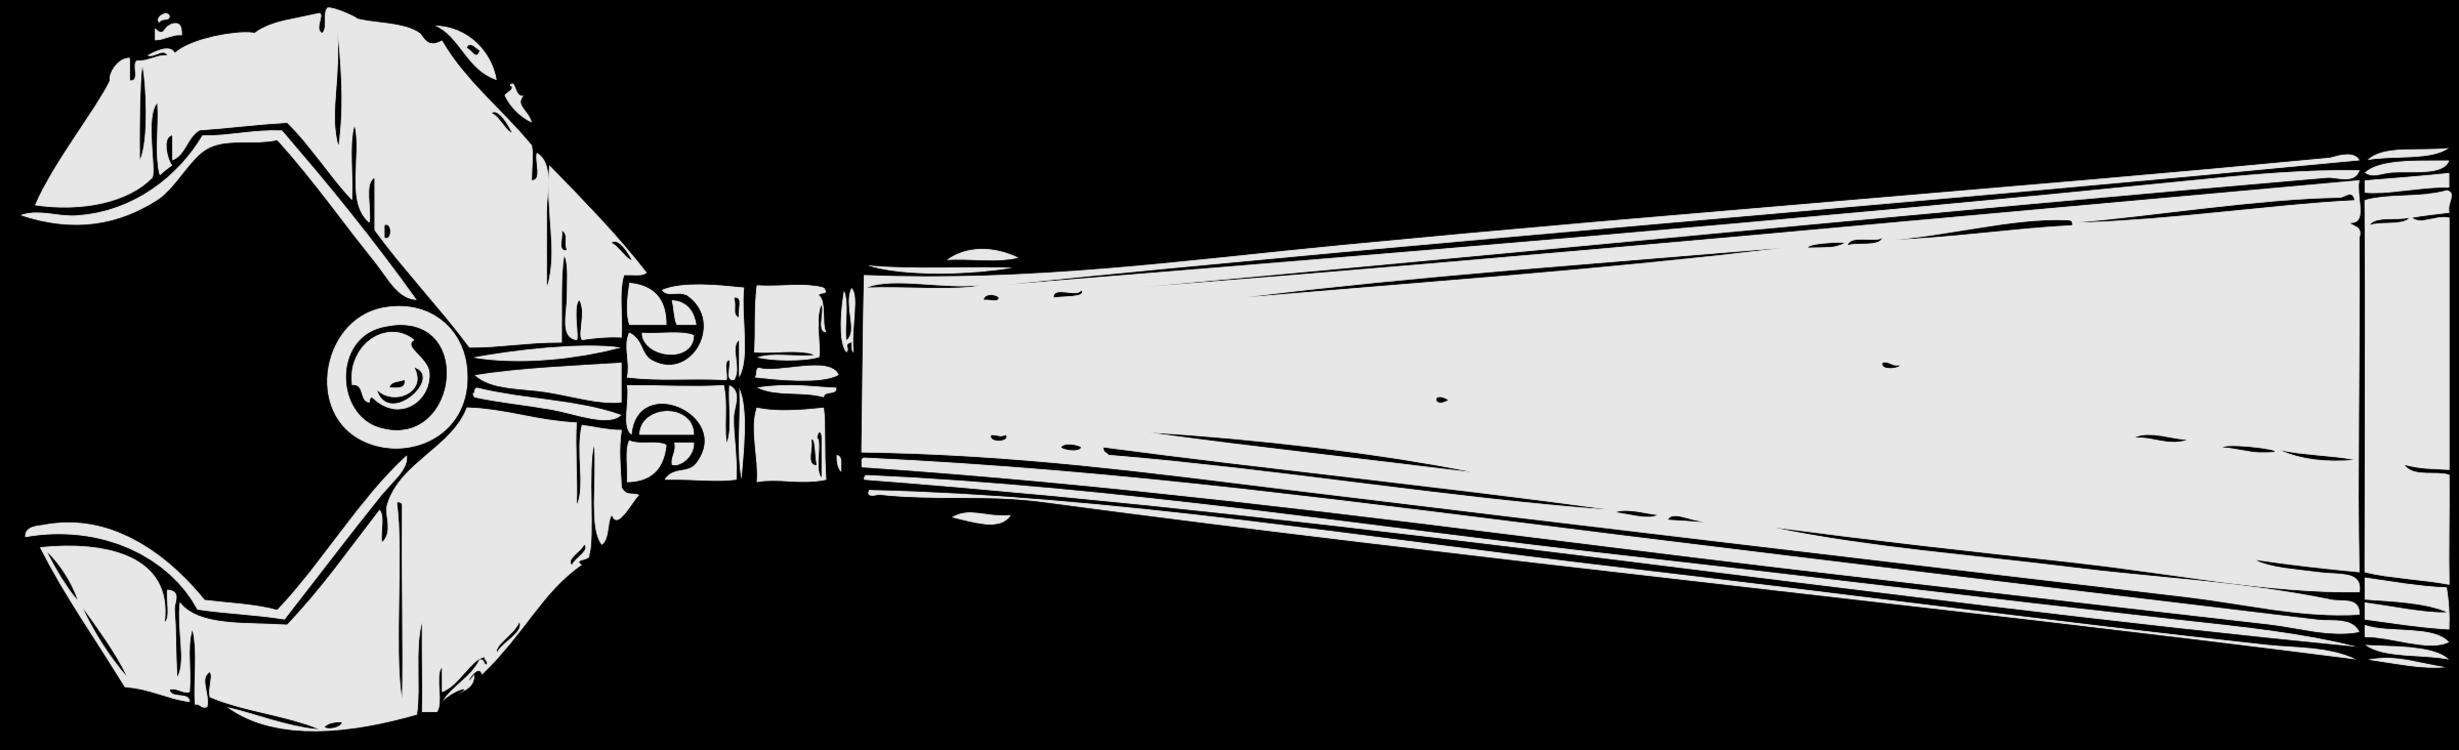 Line Art,Angle,Cold Weapon